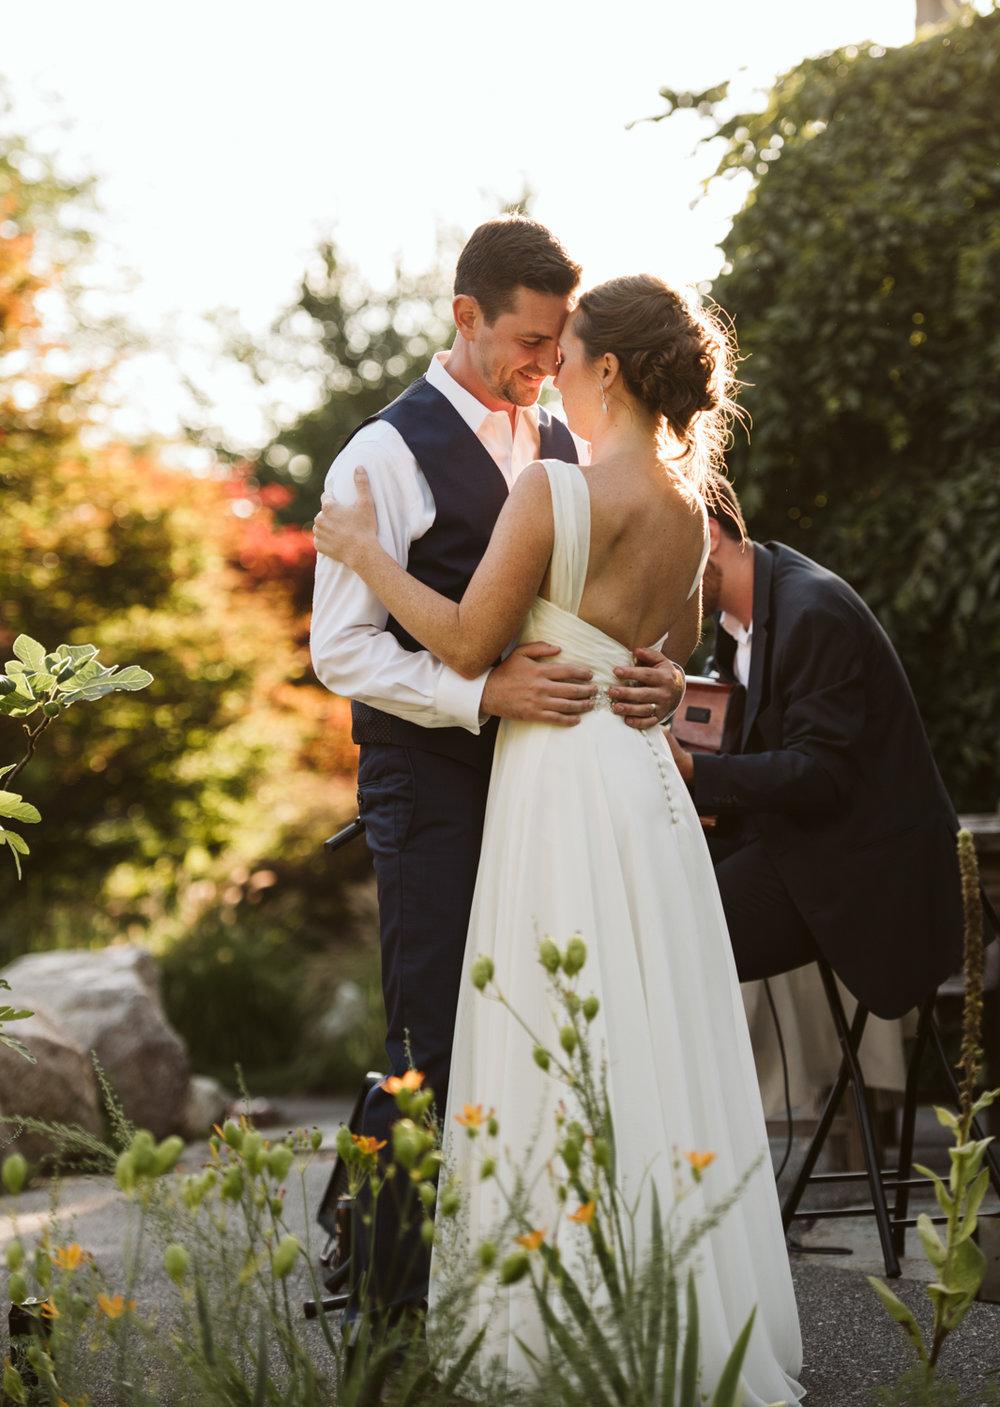 emily_alex_elm_bank_wedding_wellesley_DSC_7939.jpg